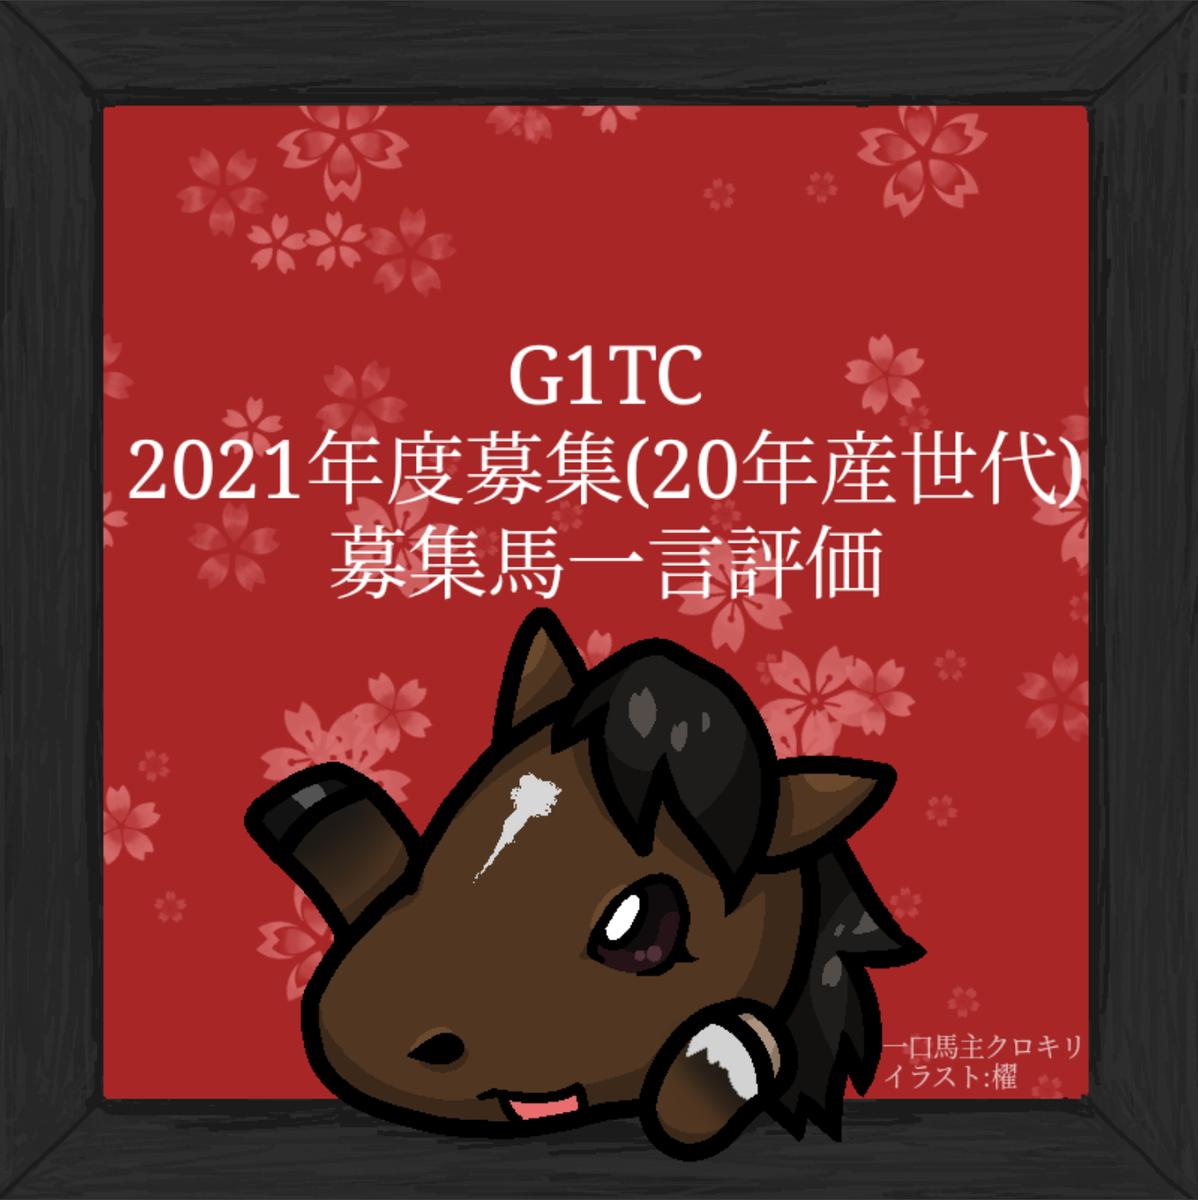 f:id:kurokiri-G1:20210614015819p:plain